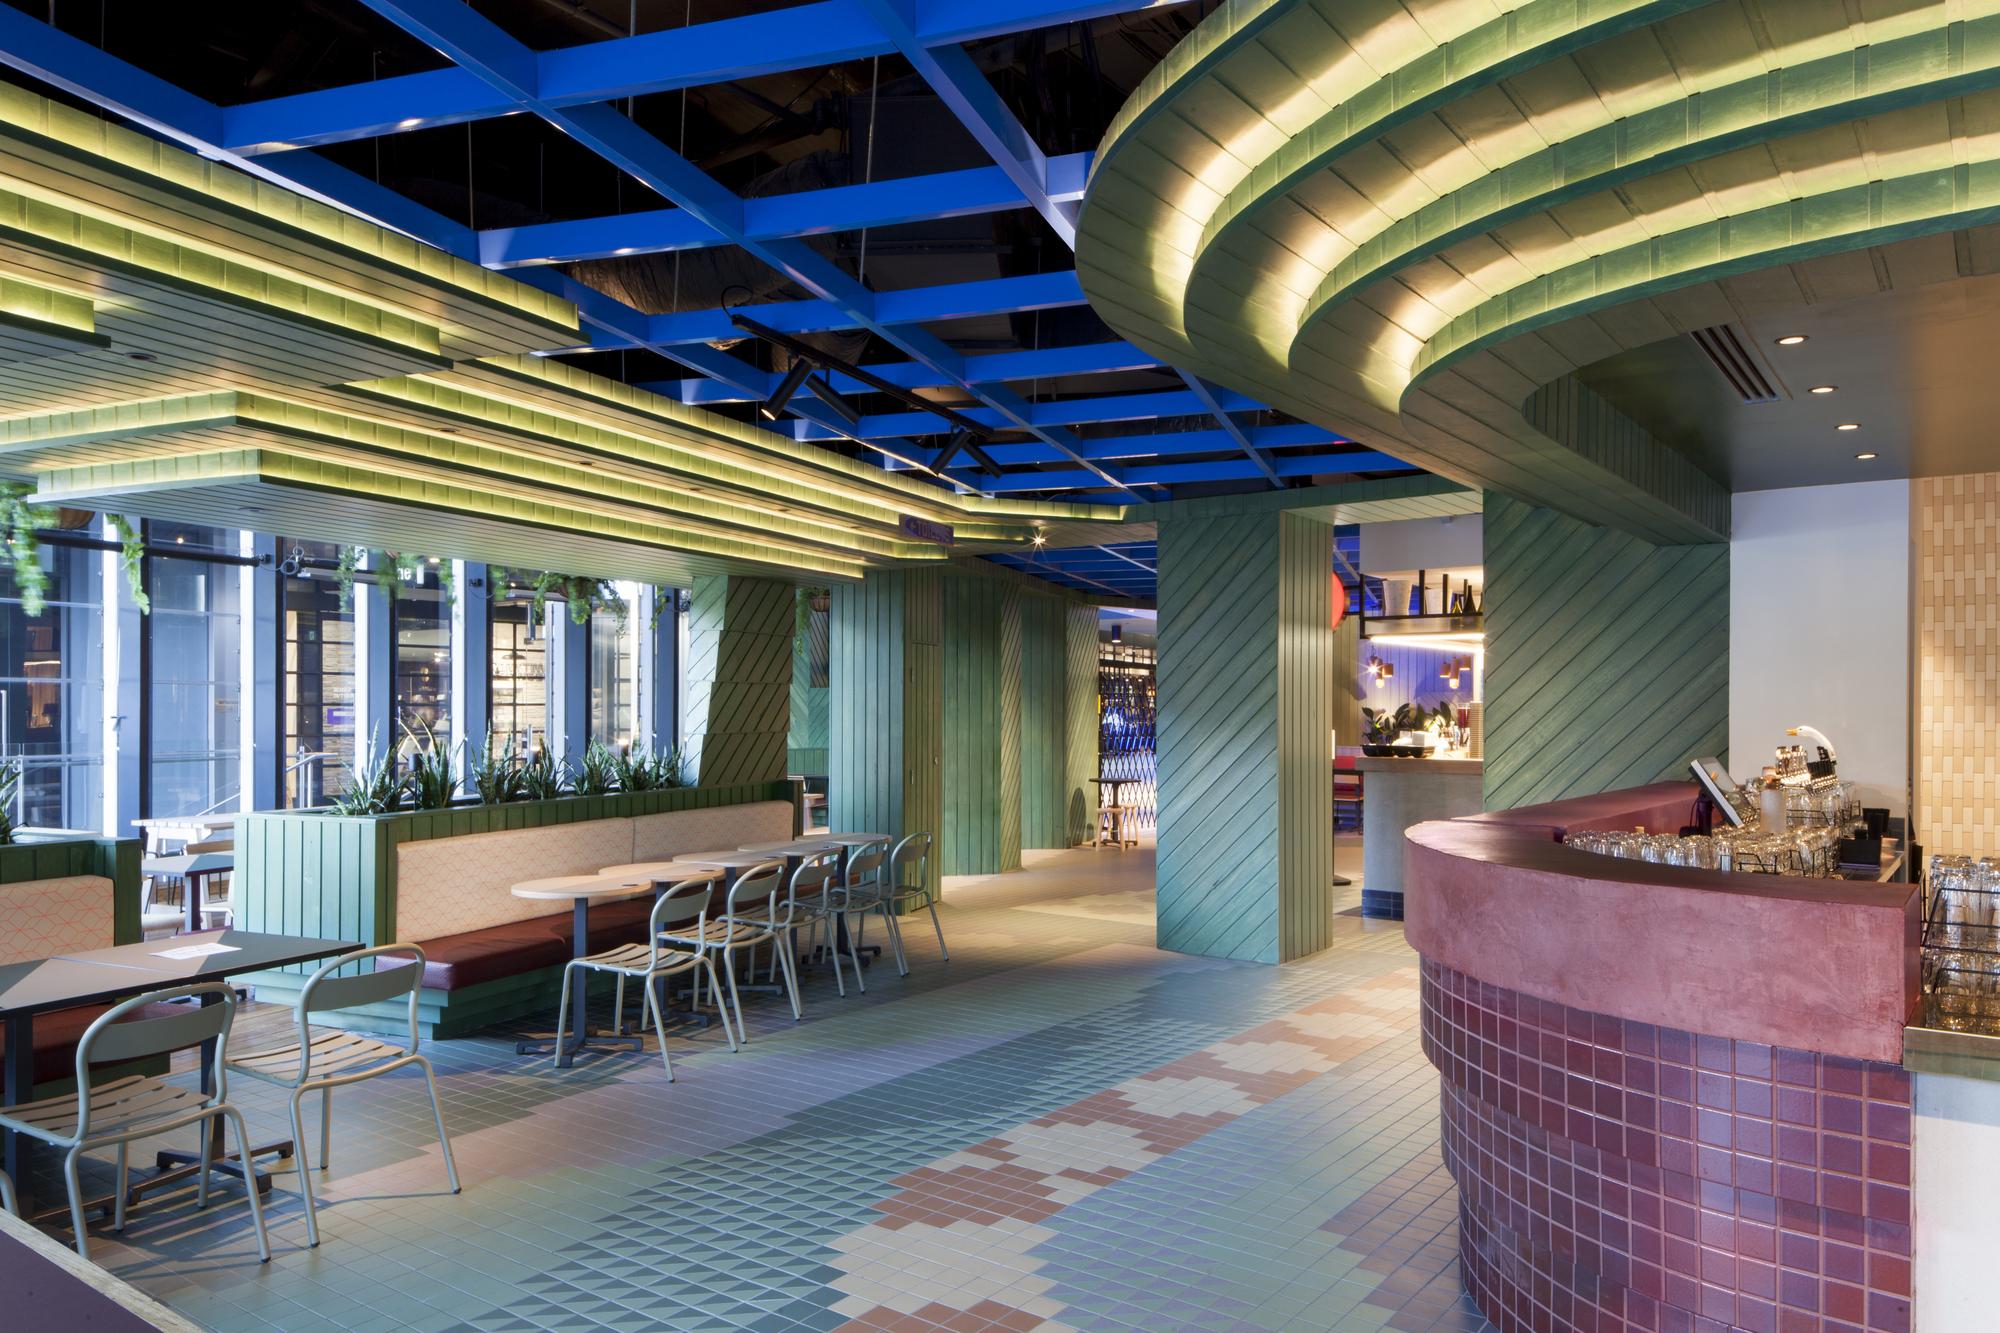 Hightail Bar / Techn Architecture and Interior Design